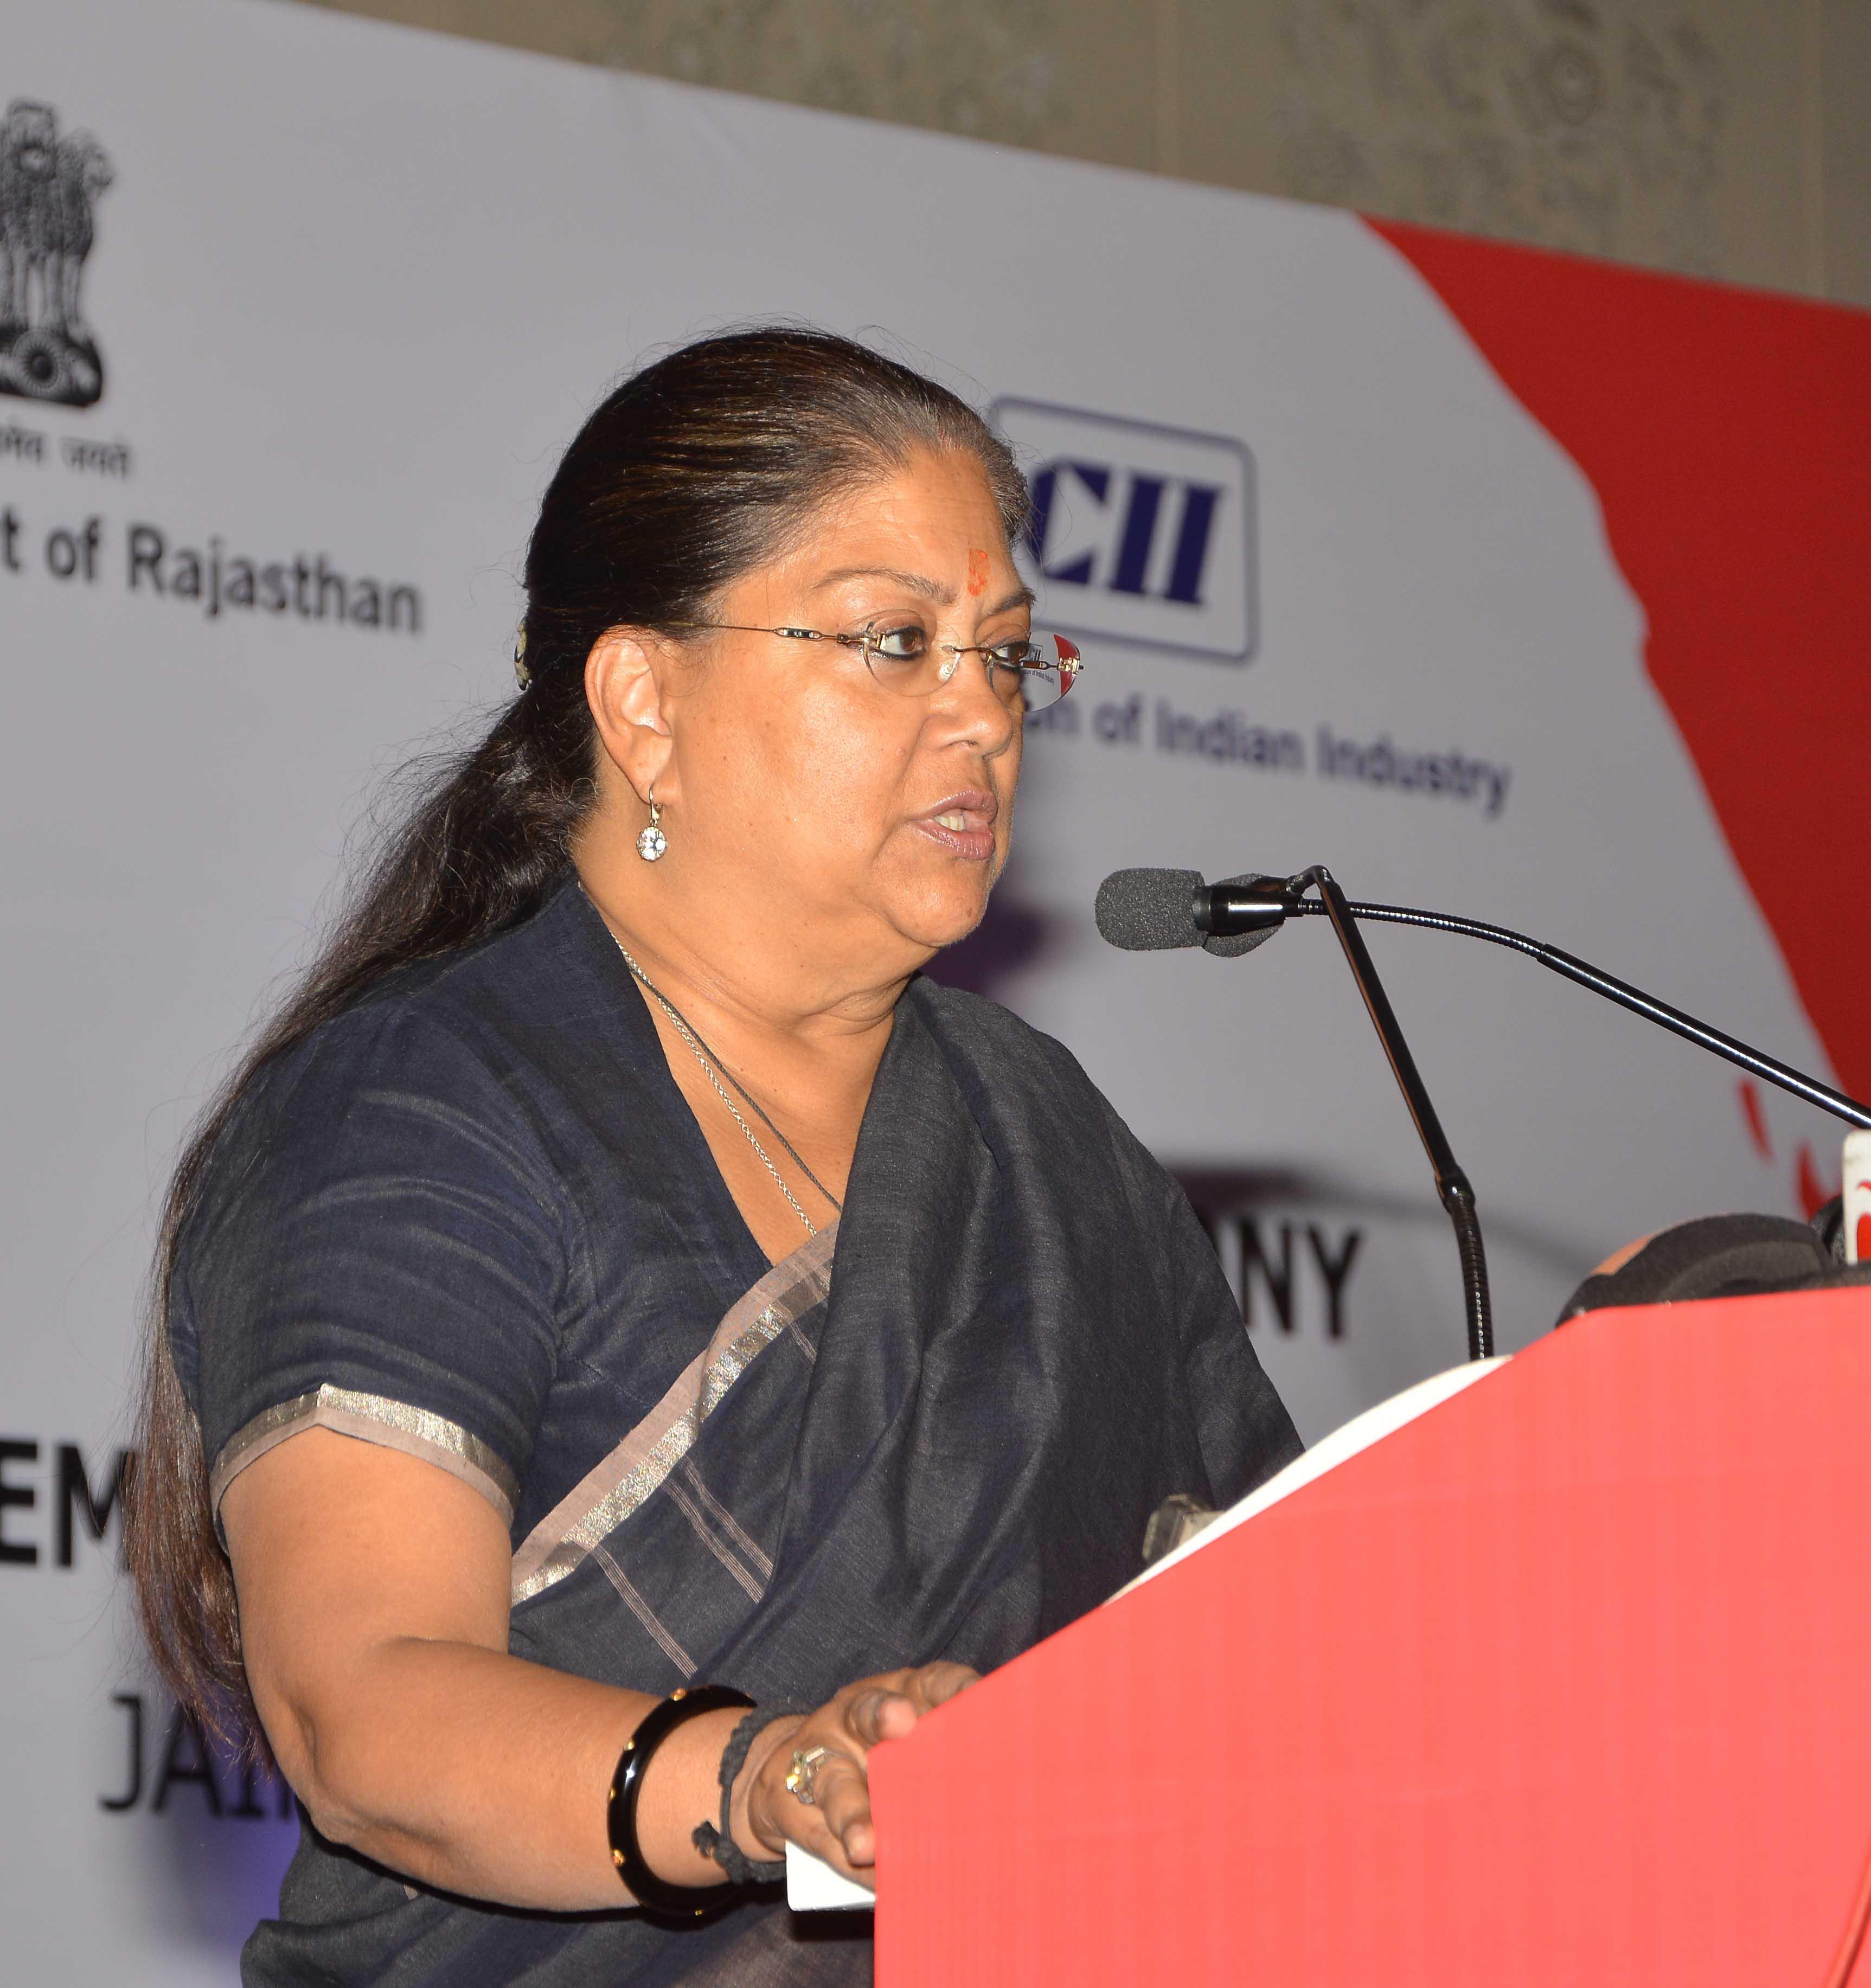 Vasundhara Raje - Rajasthan team doing hard work